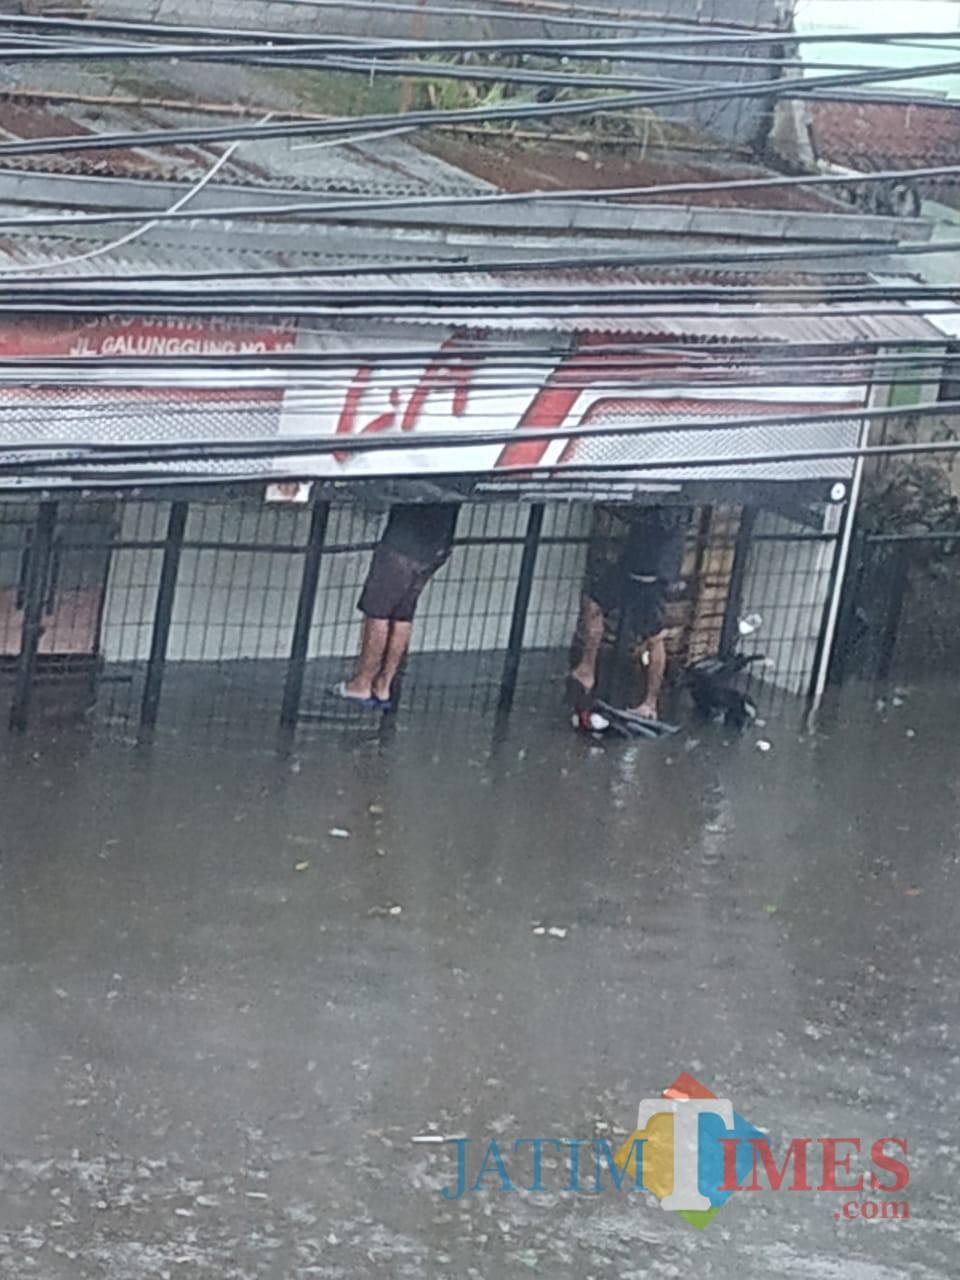 Warga memilih memanjat pagar untuk menghindari banjir yang terjadi di Kota Malang. (Foto: Dokumen MalangTIMES)